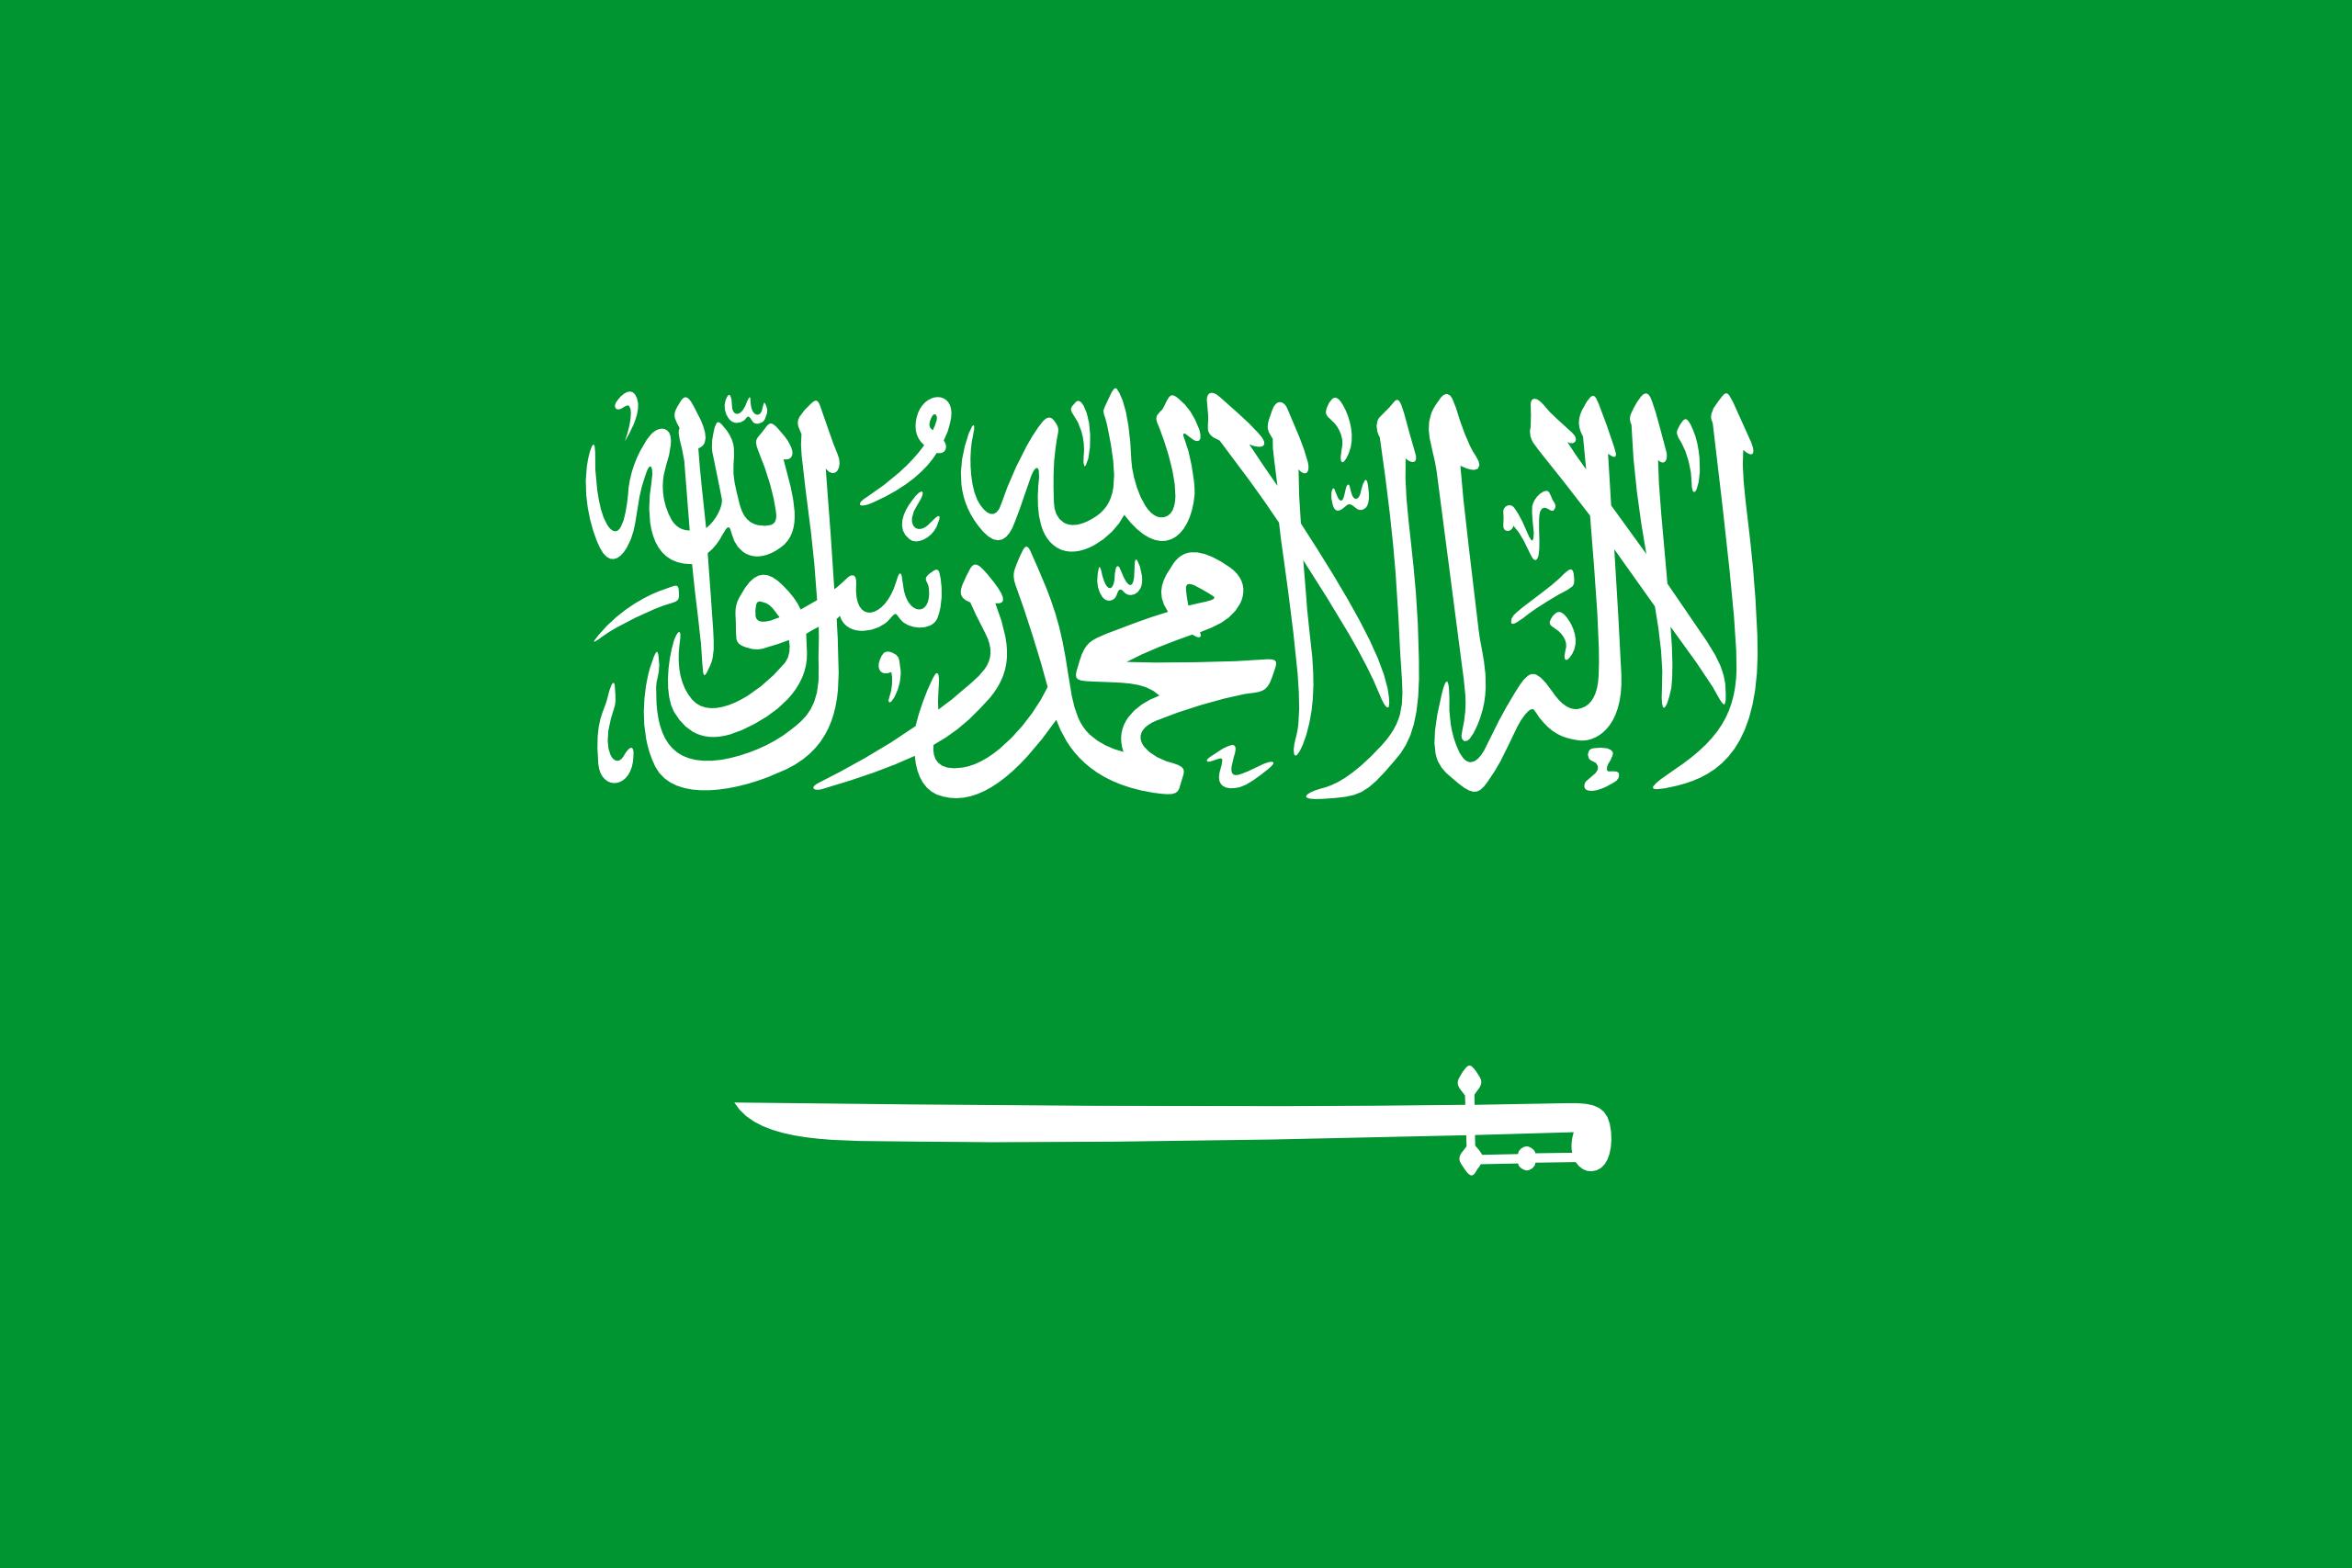 arabia saudita, país, emblema, insignia, σύμβολο - Wallpapers HD - Professor-falken.com